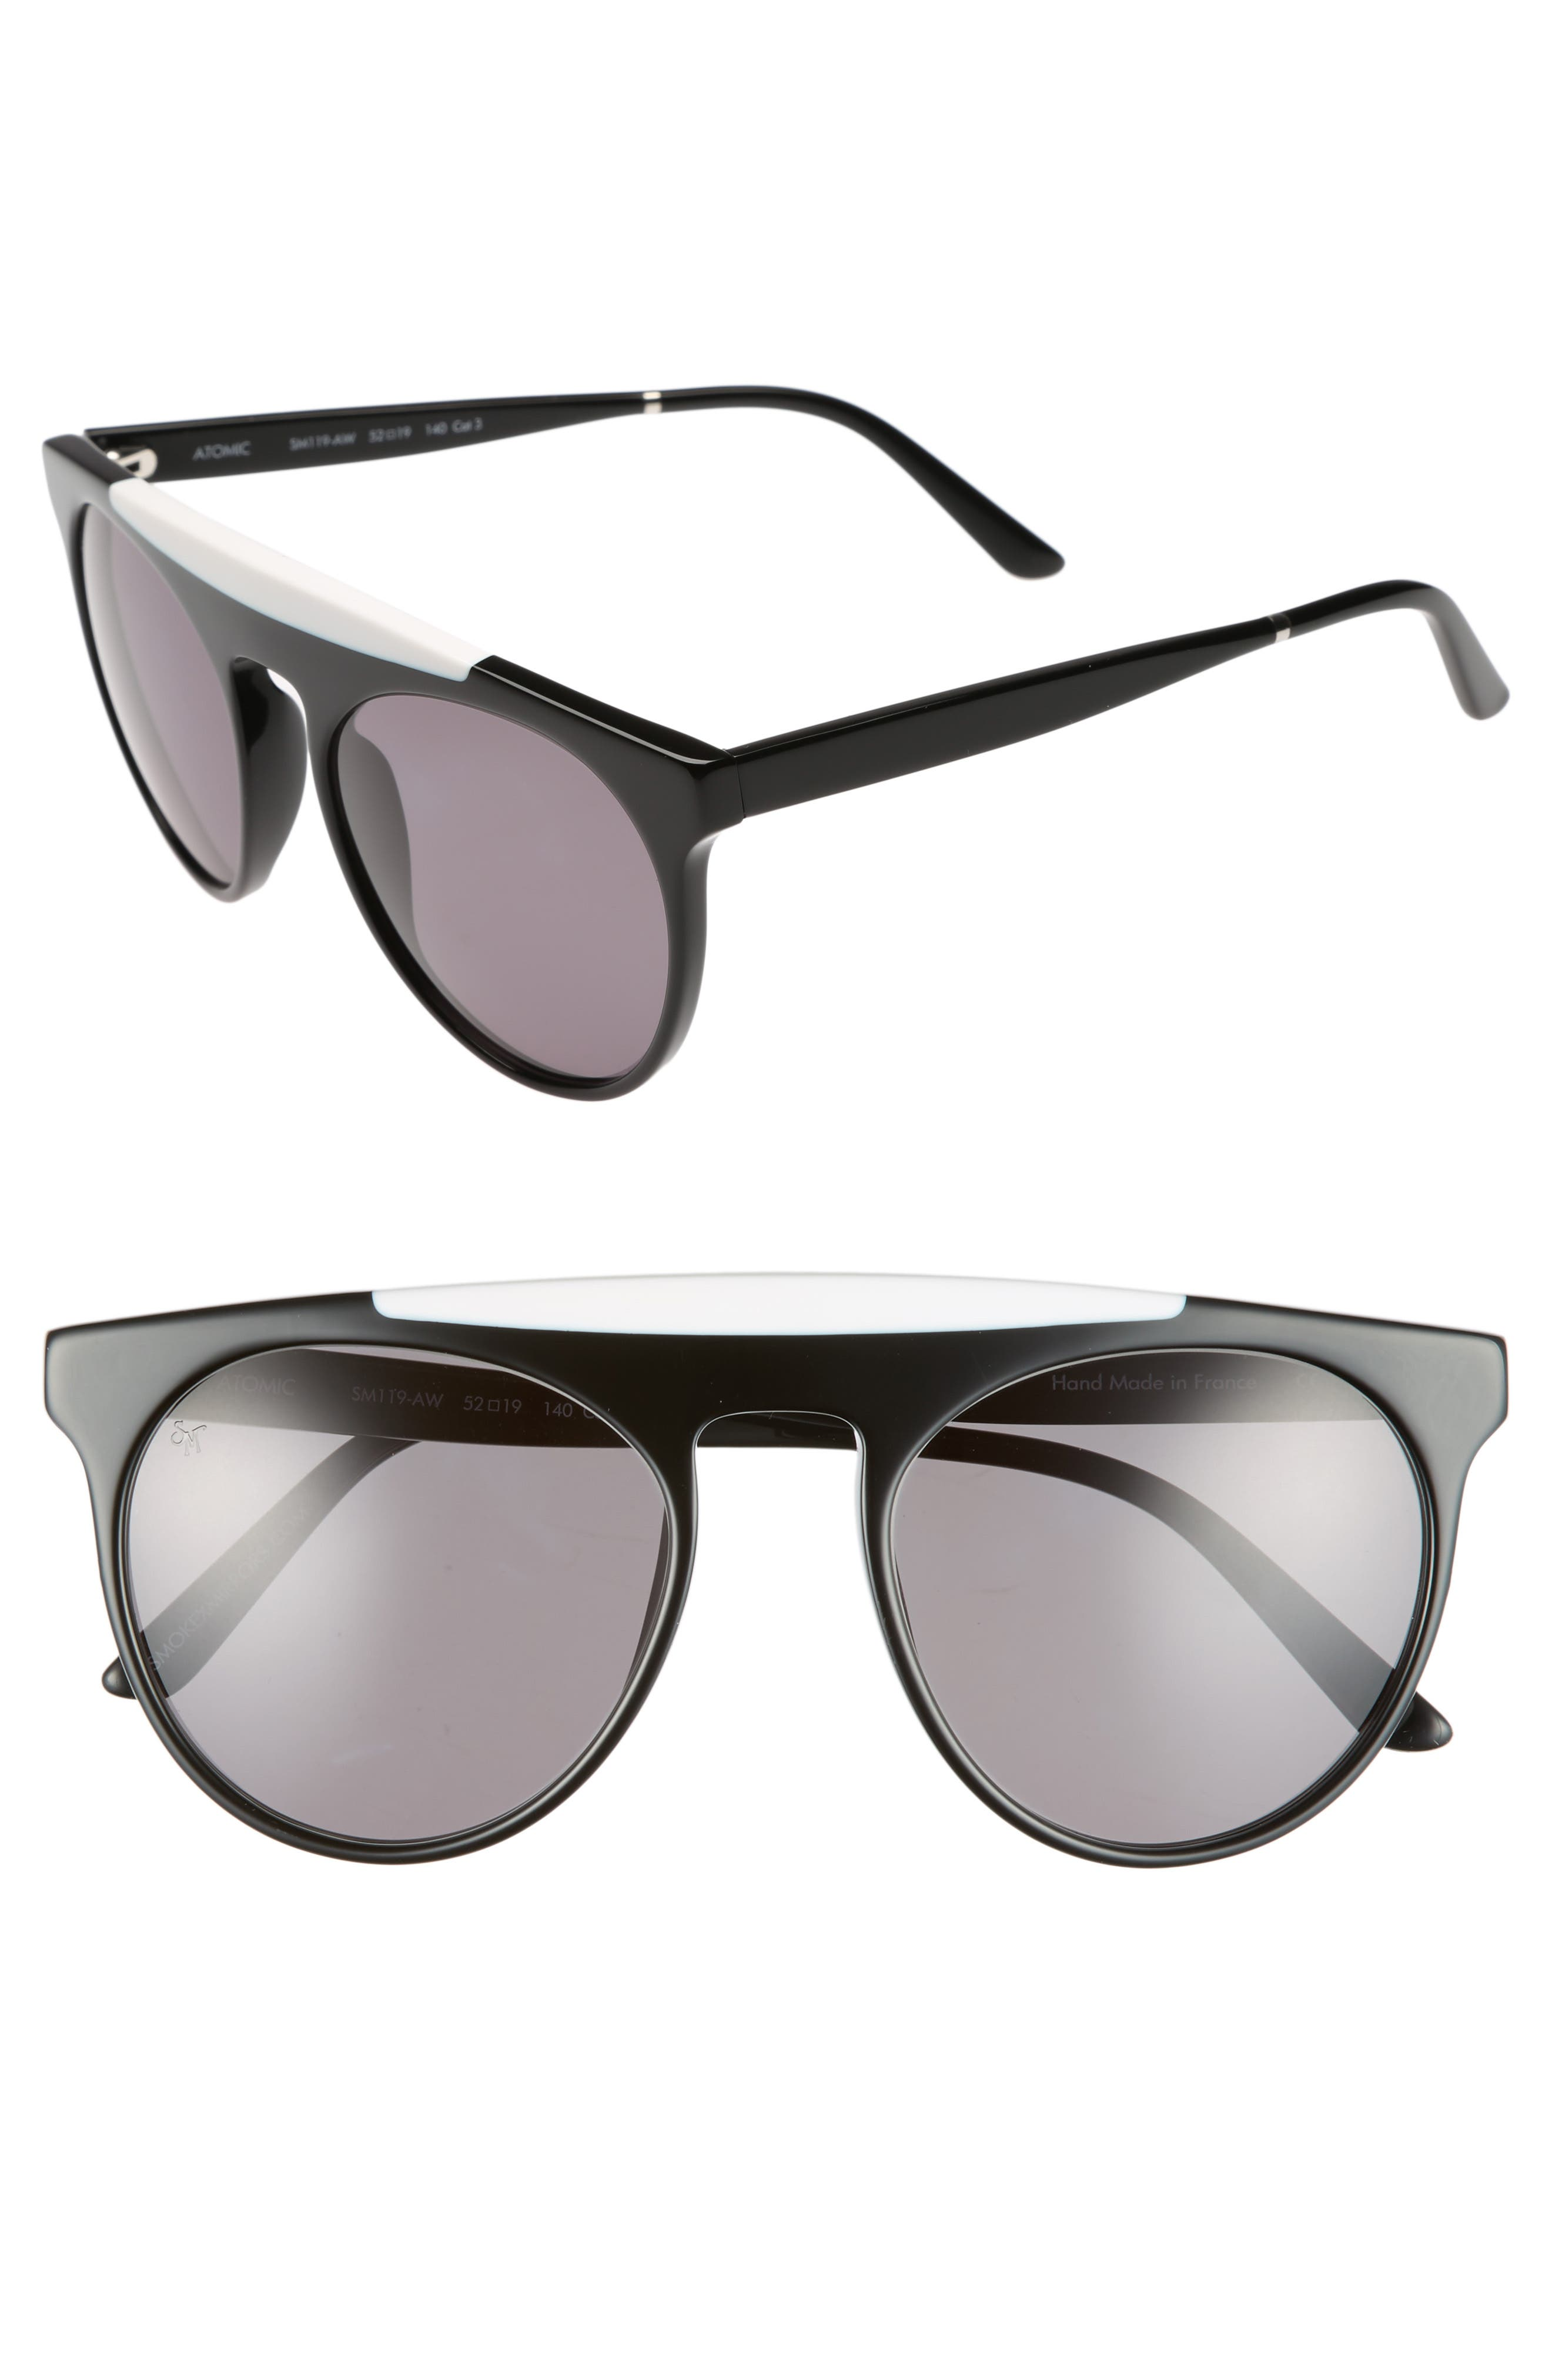 Atomic 52mm Sunglasses,                         Main,                         color, 001